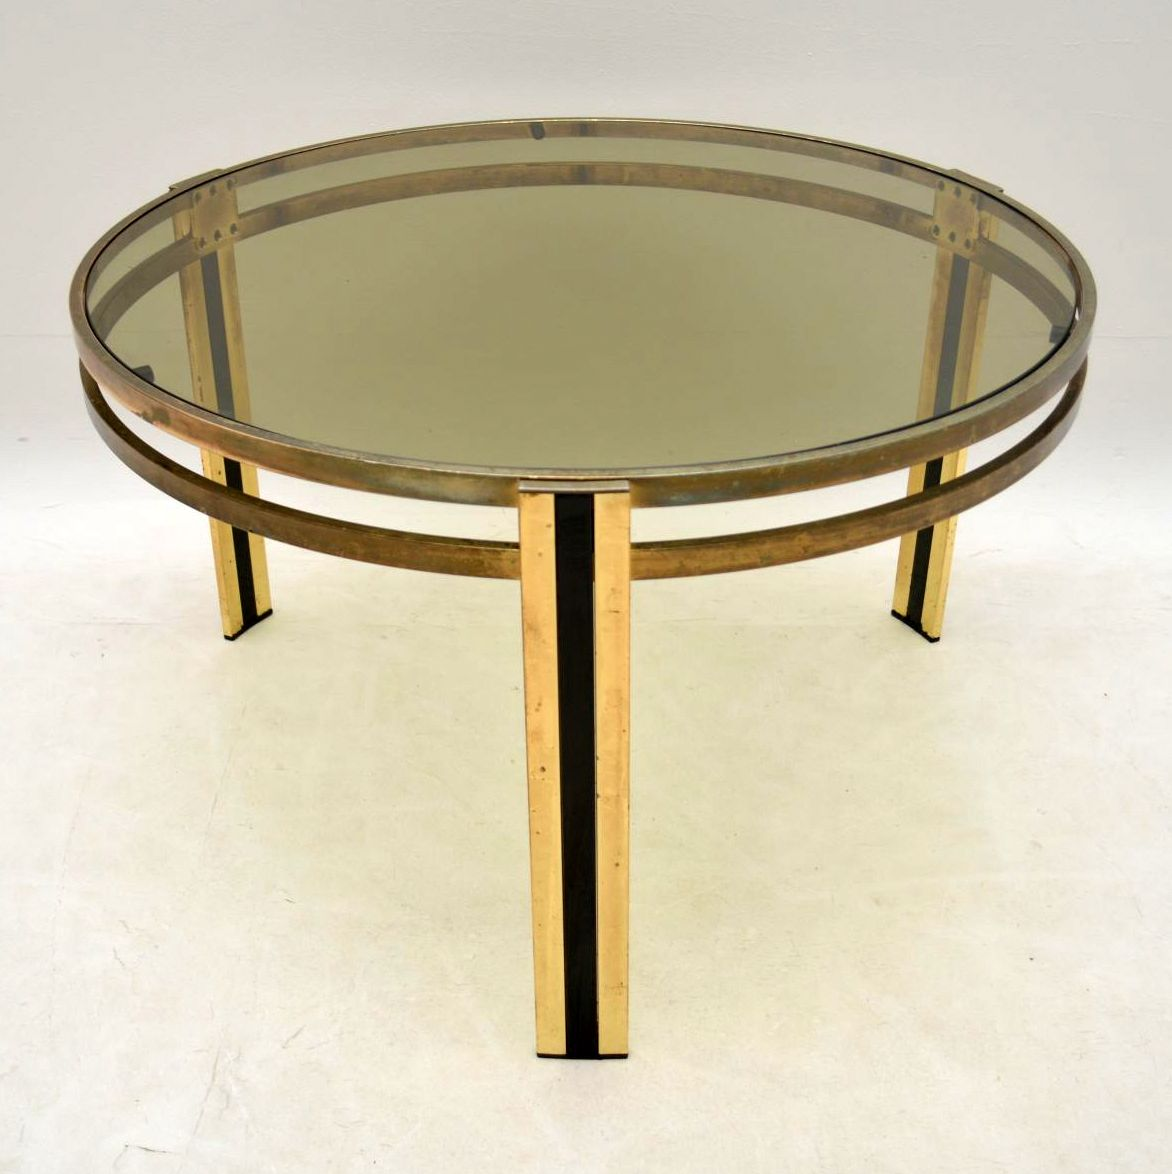 Retro Brass Coffee Table Vintage 1960's